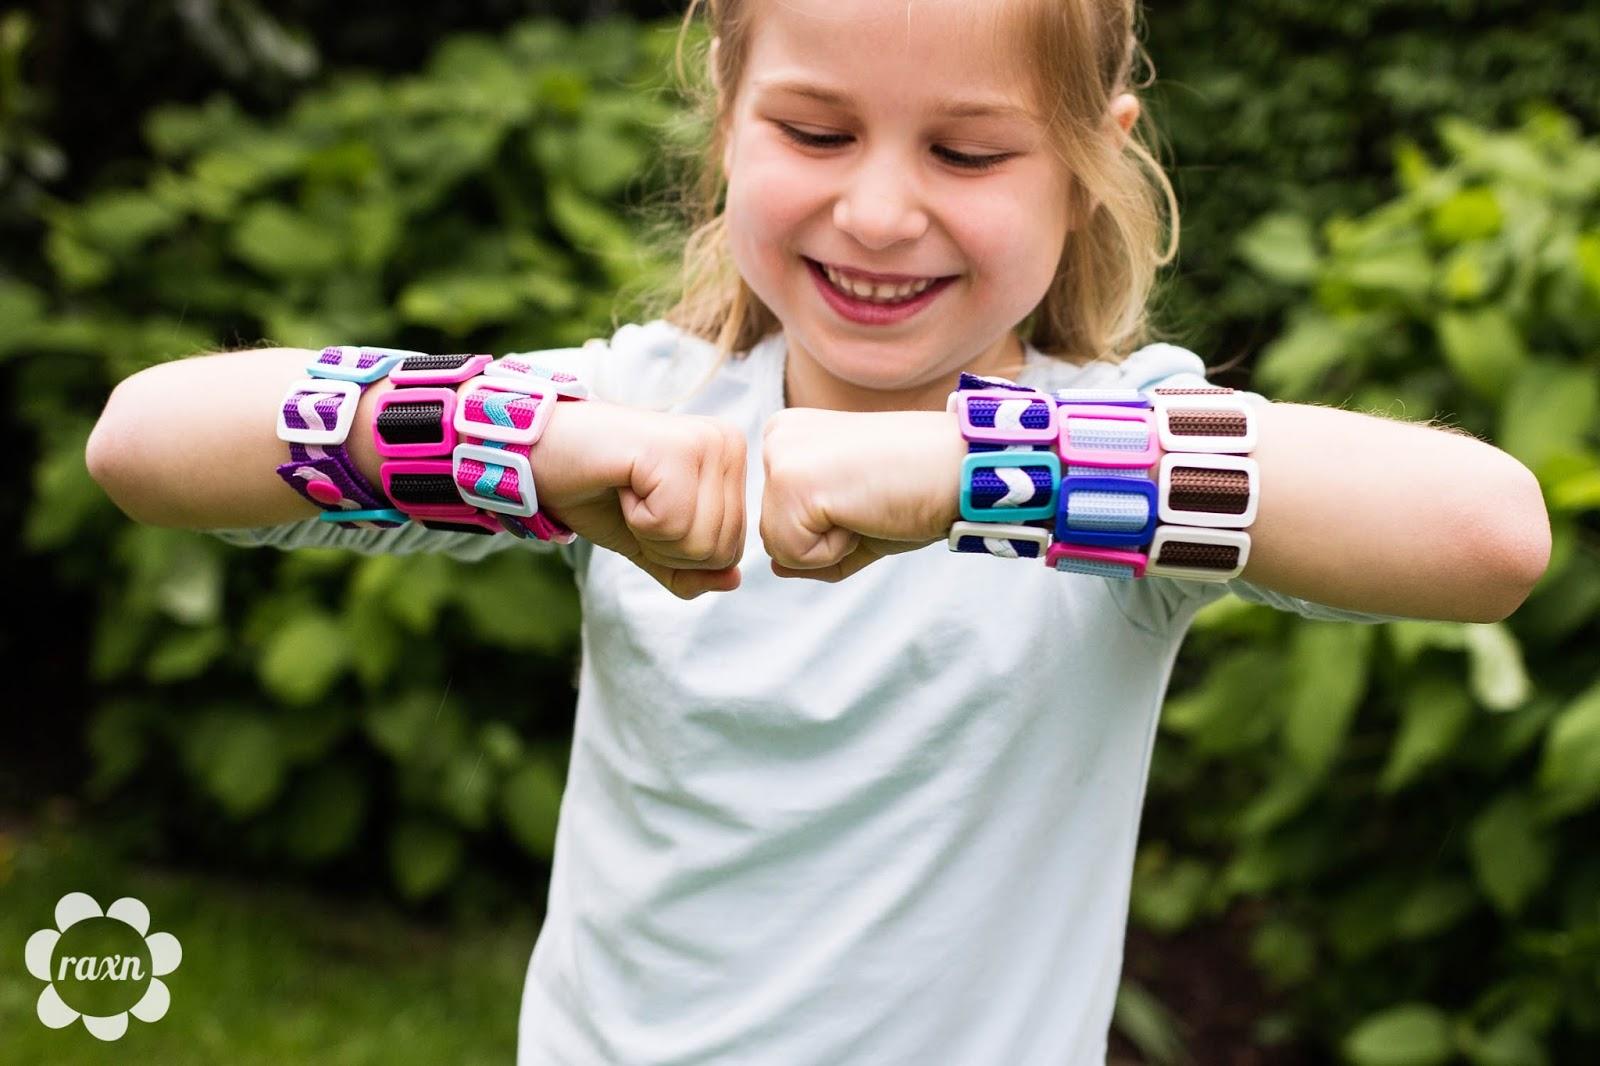 raxn armbandschmuck f r kinder kreatives gestalten mit kindern an der n hmaschine meine diy. Black Bedroom Furniture Sets. Home Design Ideas